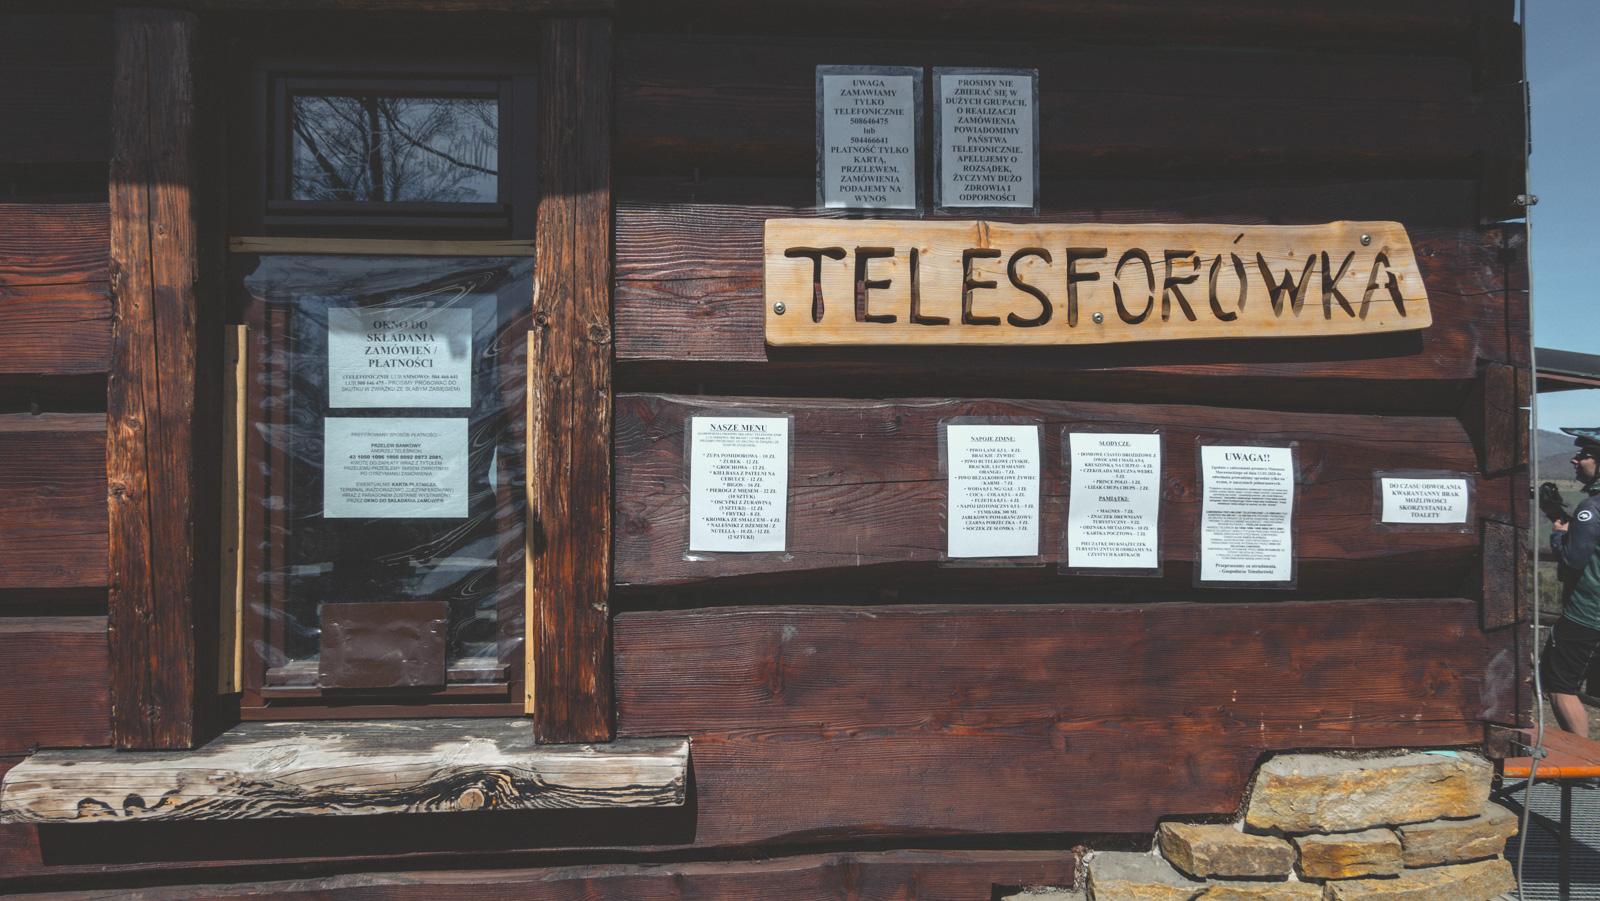 Telesforówka